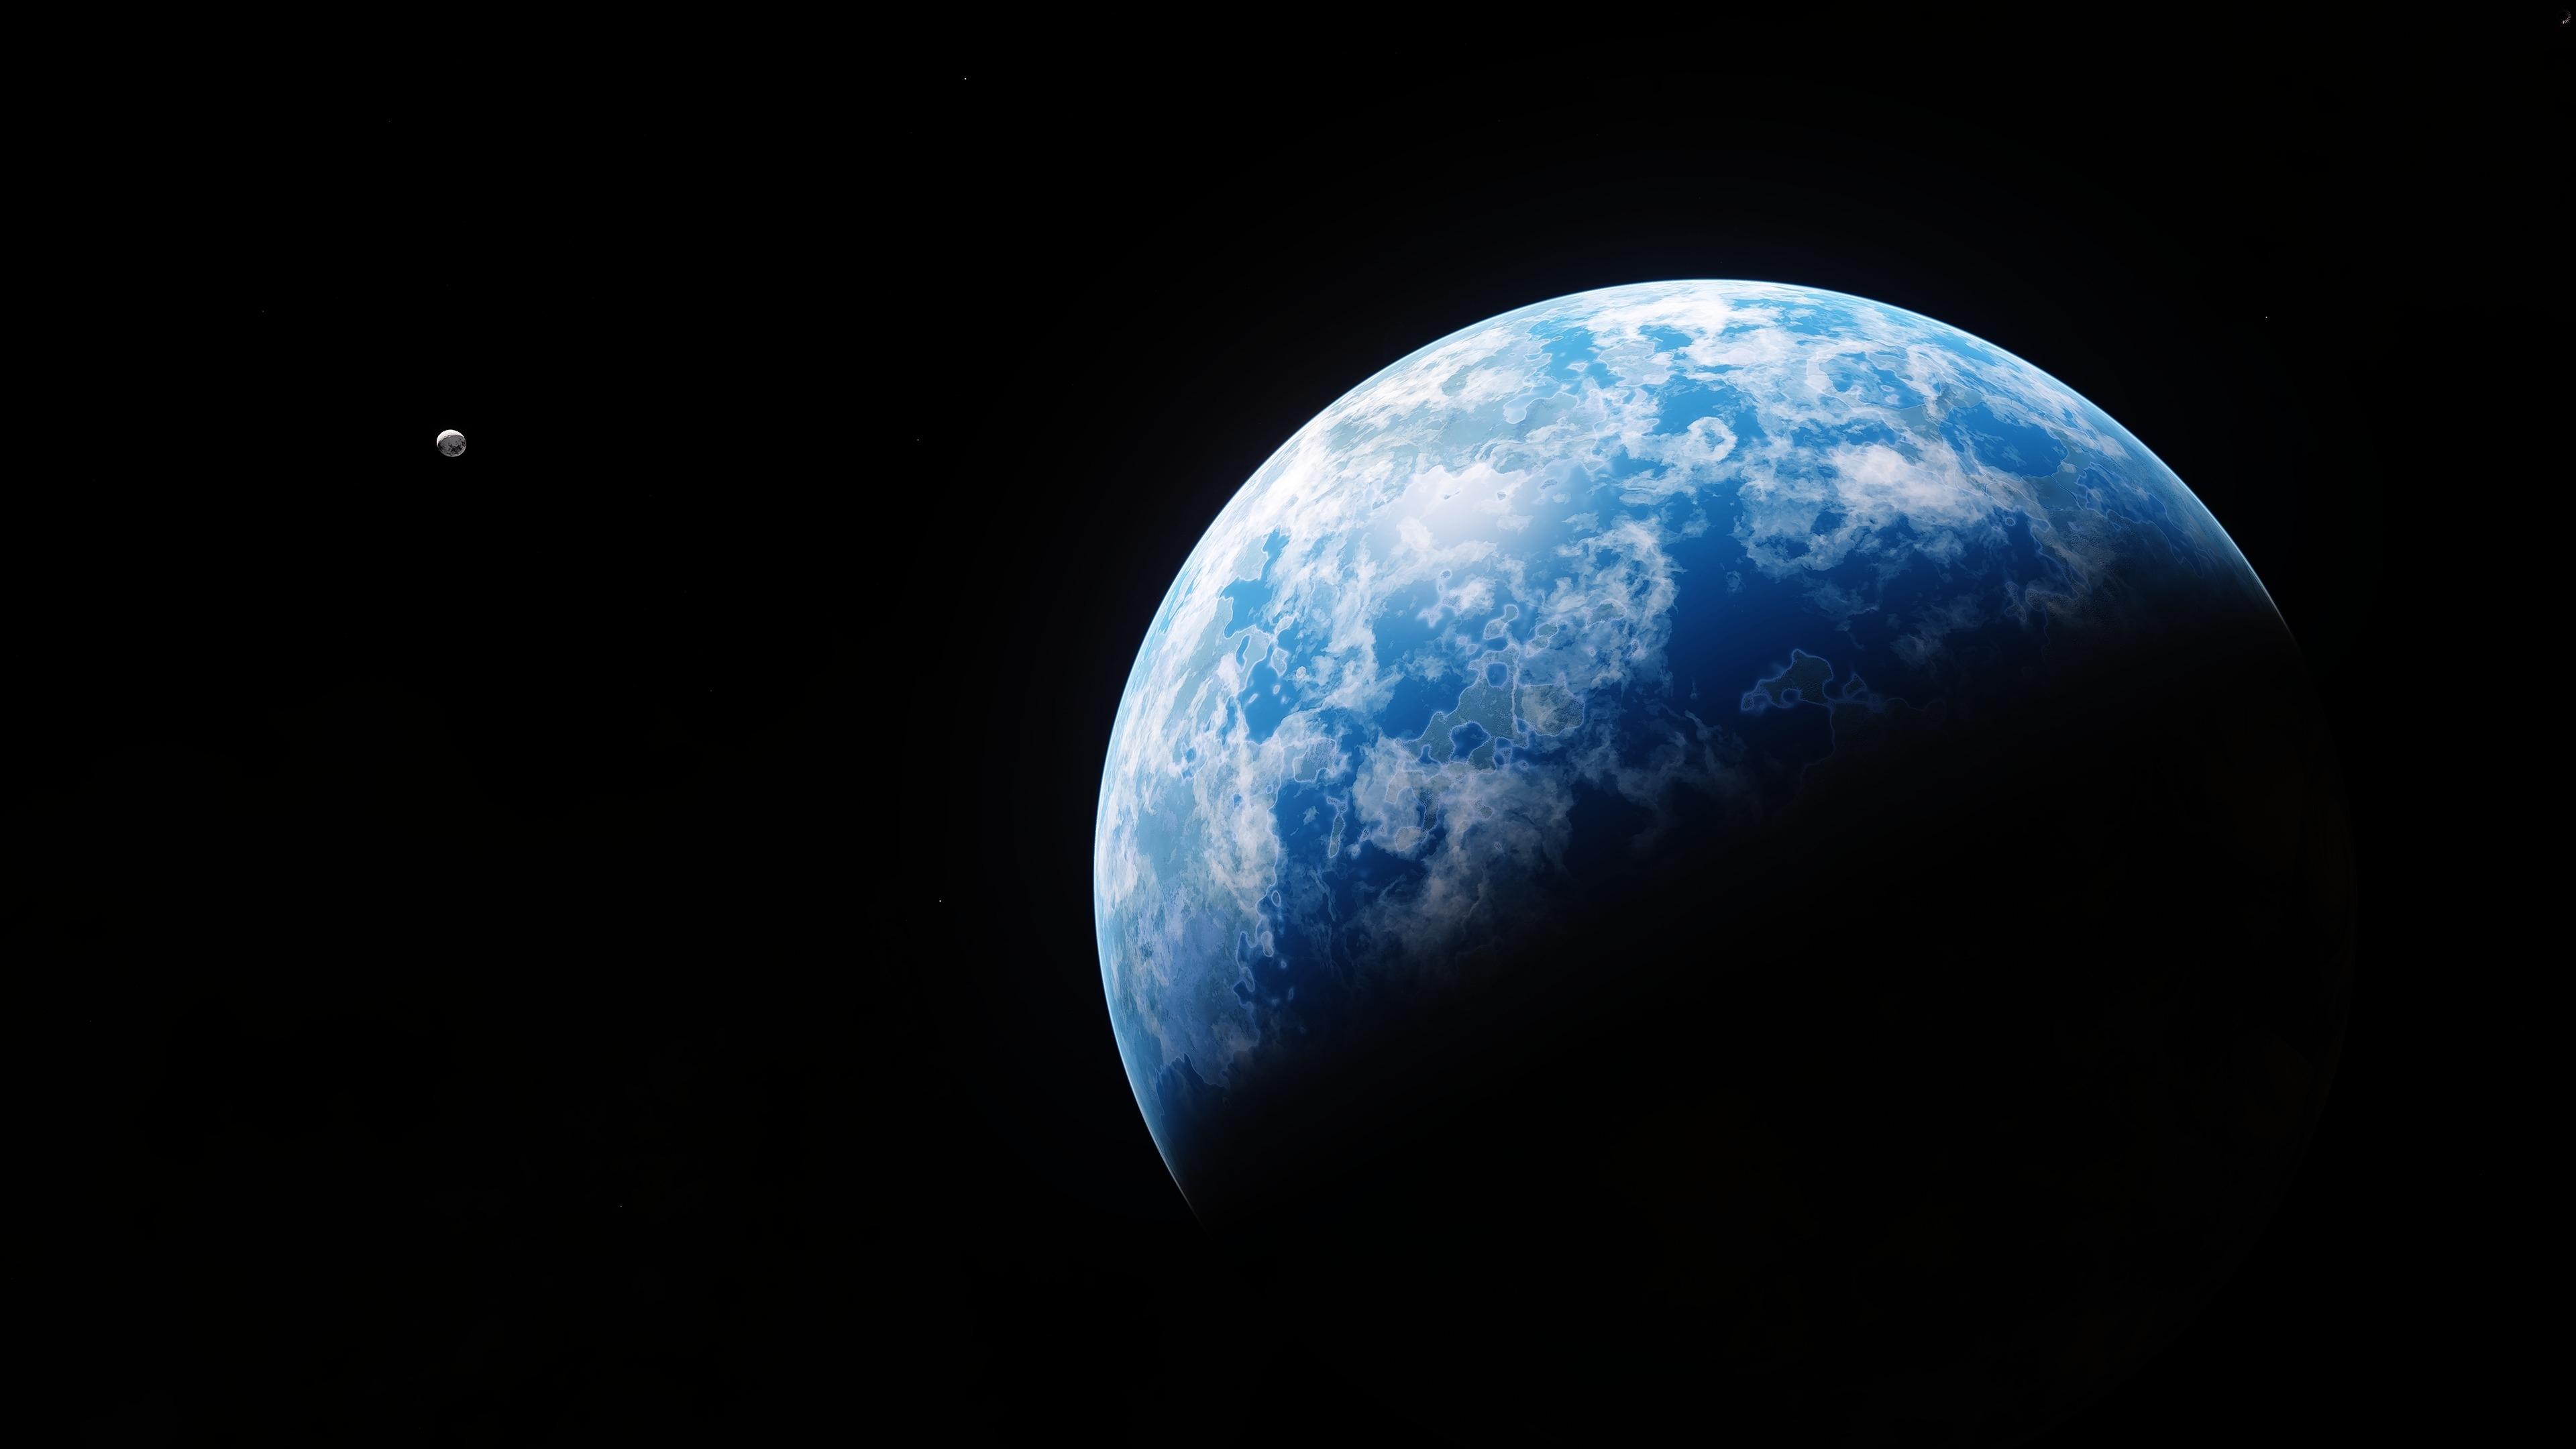 4k planet